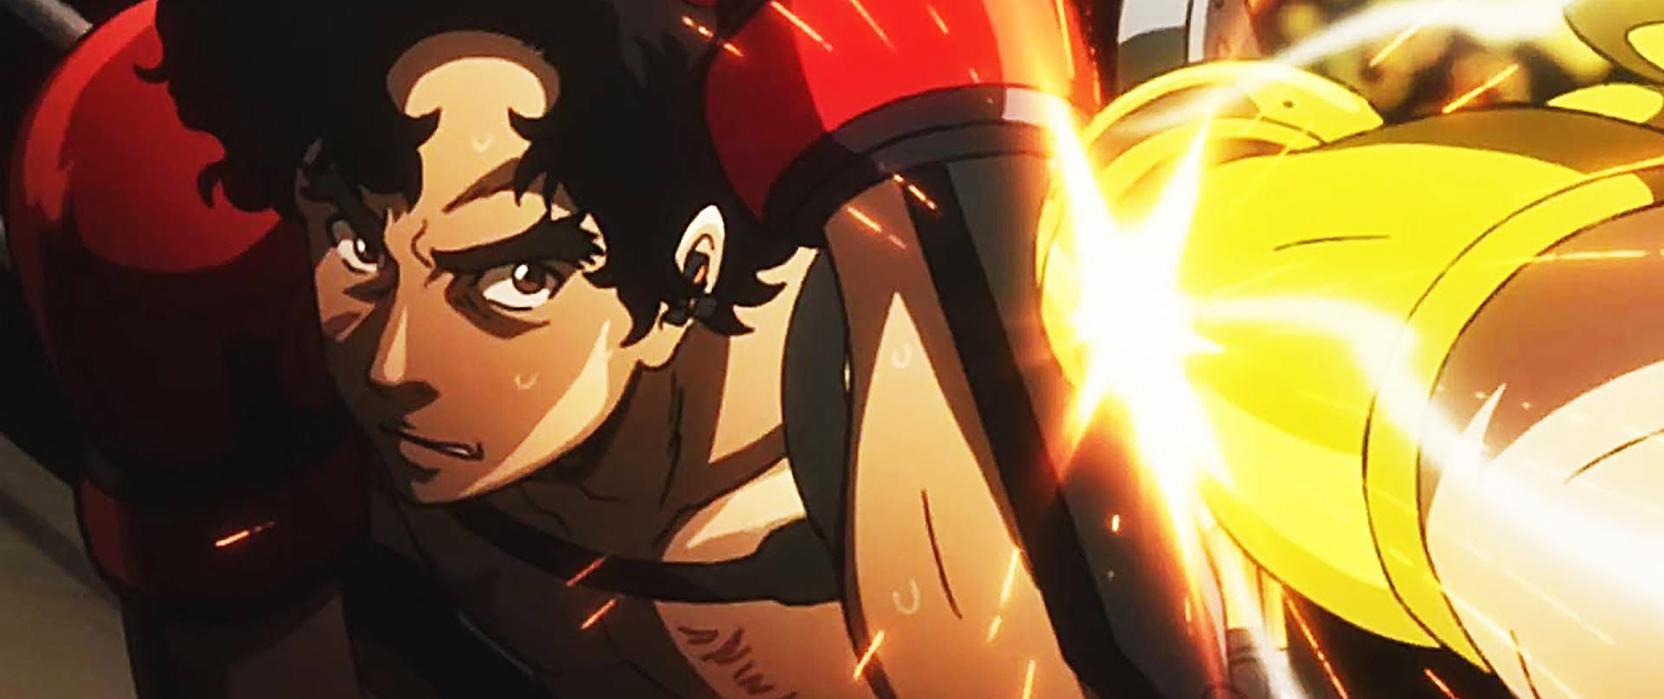 Megalo box, una joya del anime.